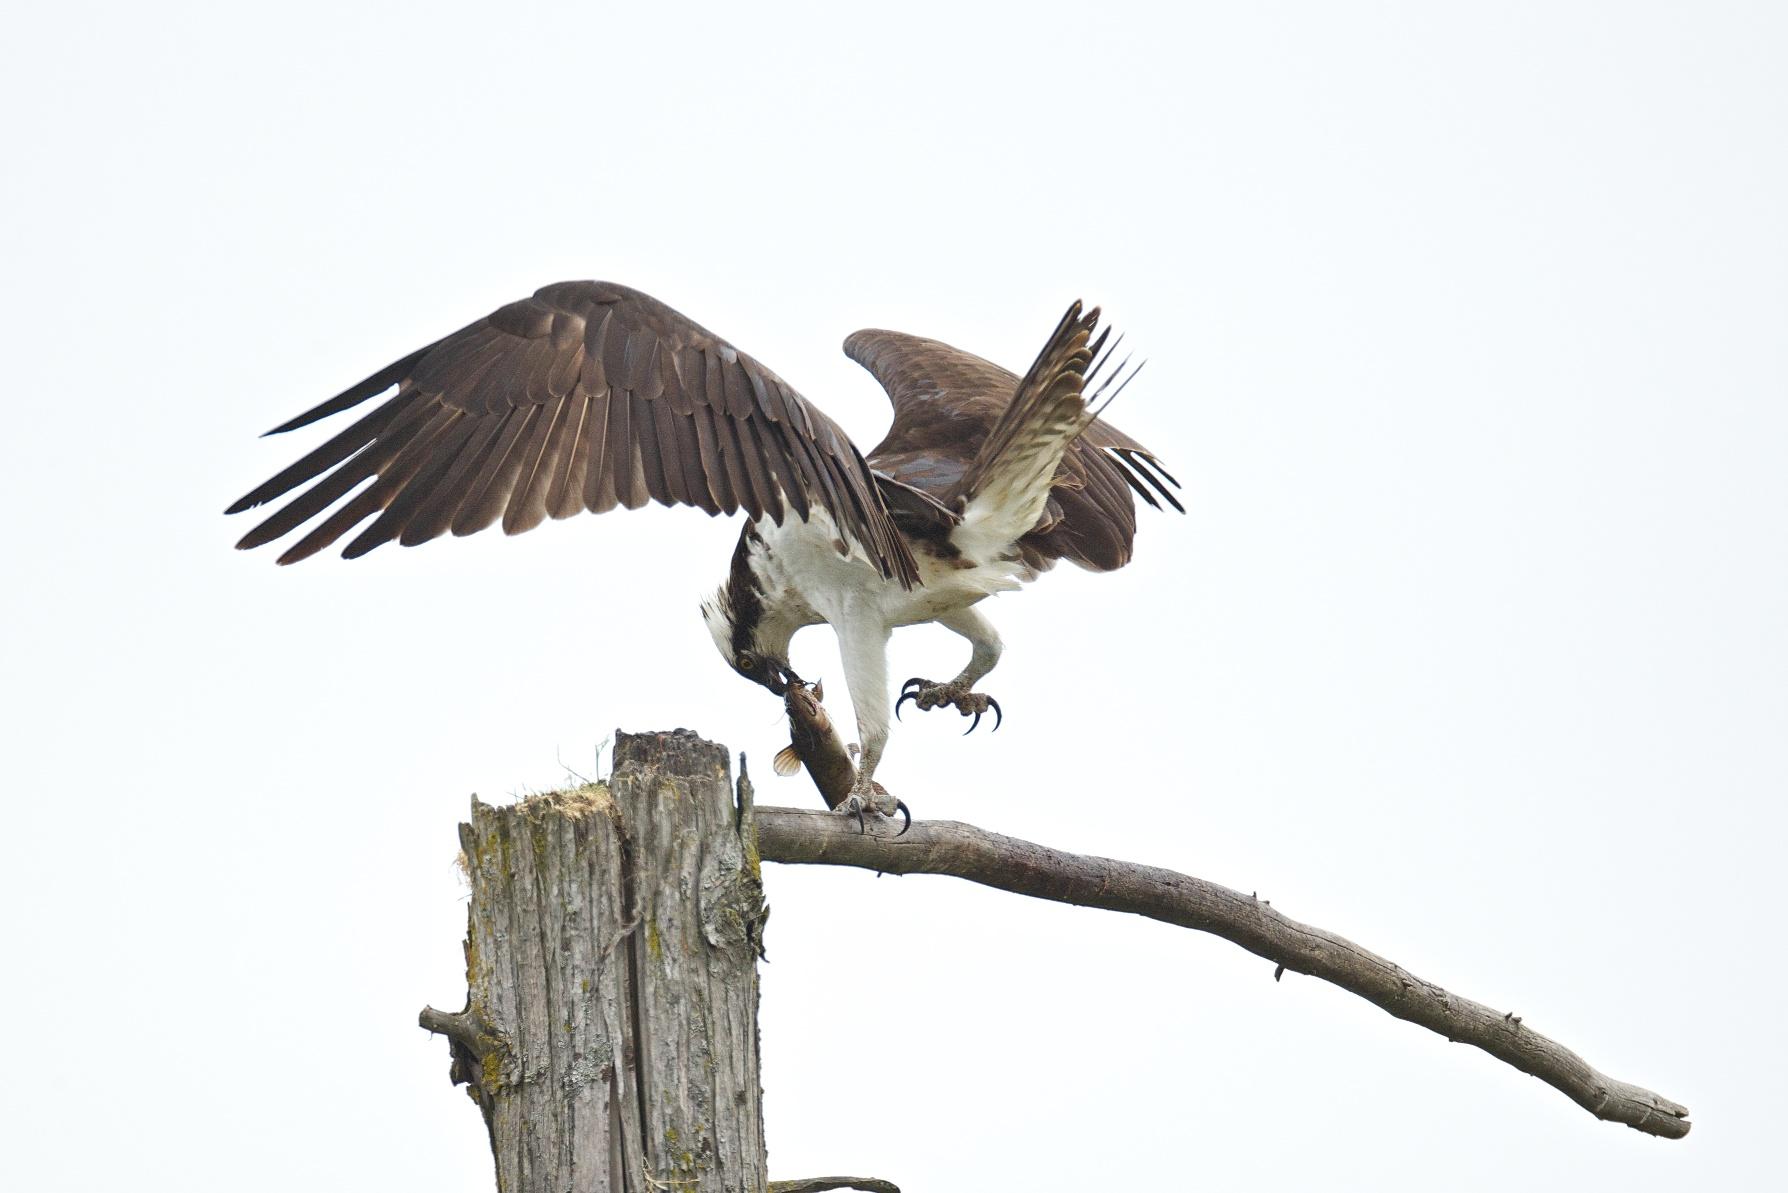 osprey eating fish 5